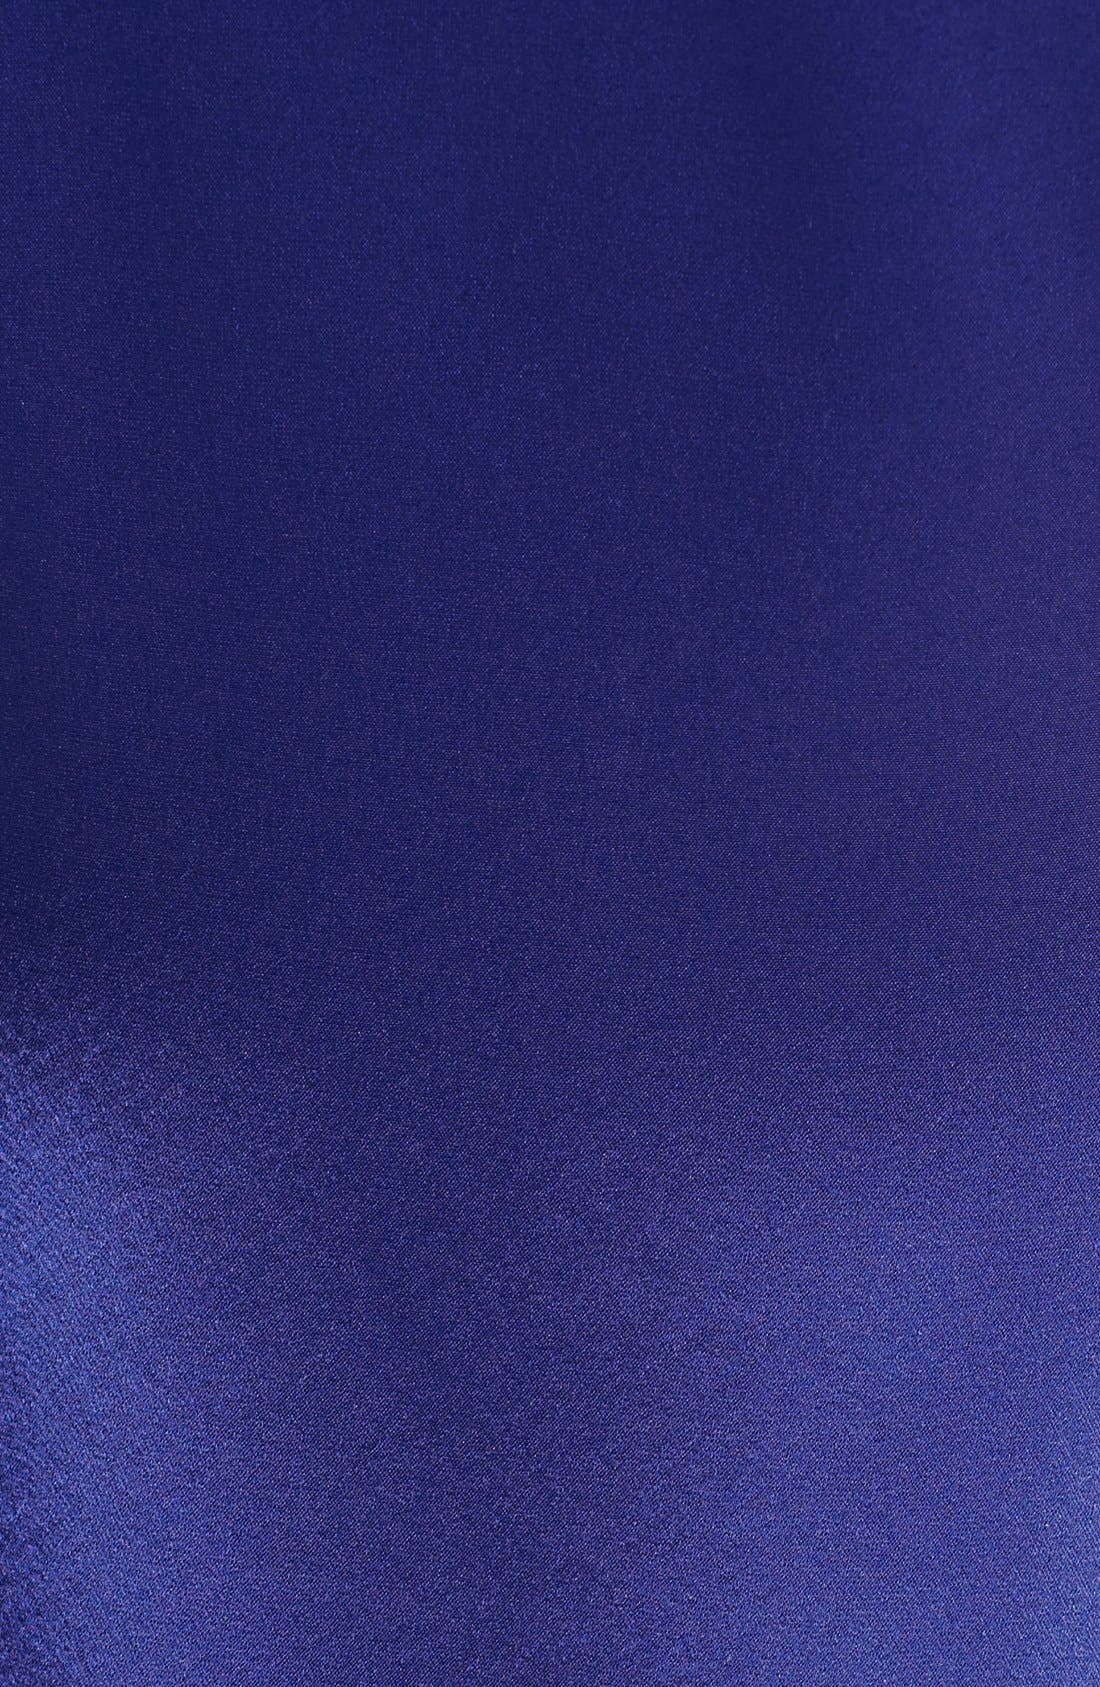 Liquid Satin Cowl Neck Dress,                             Alternate thumbnail 2, color,                             400